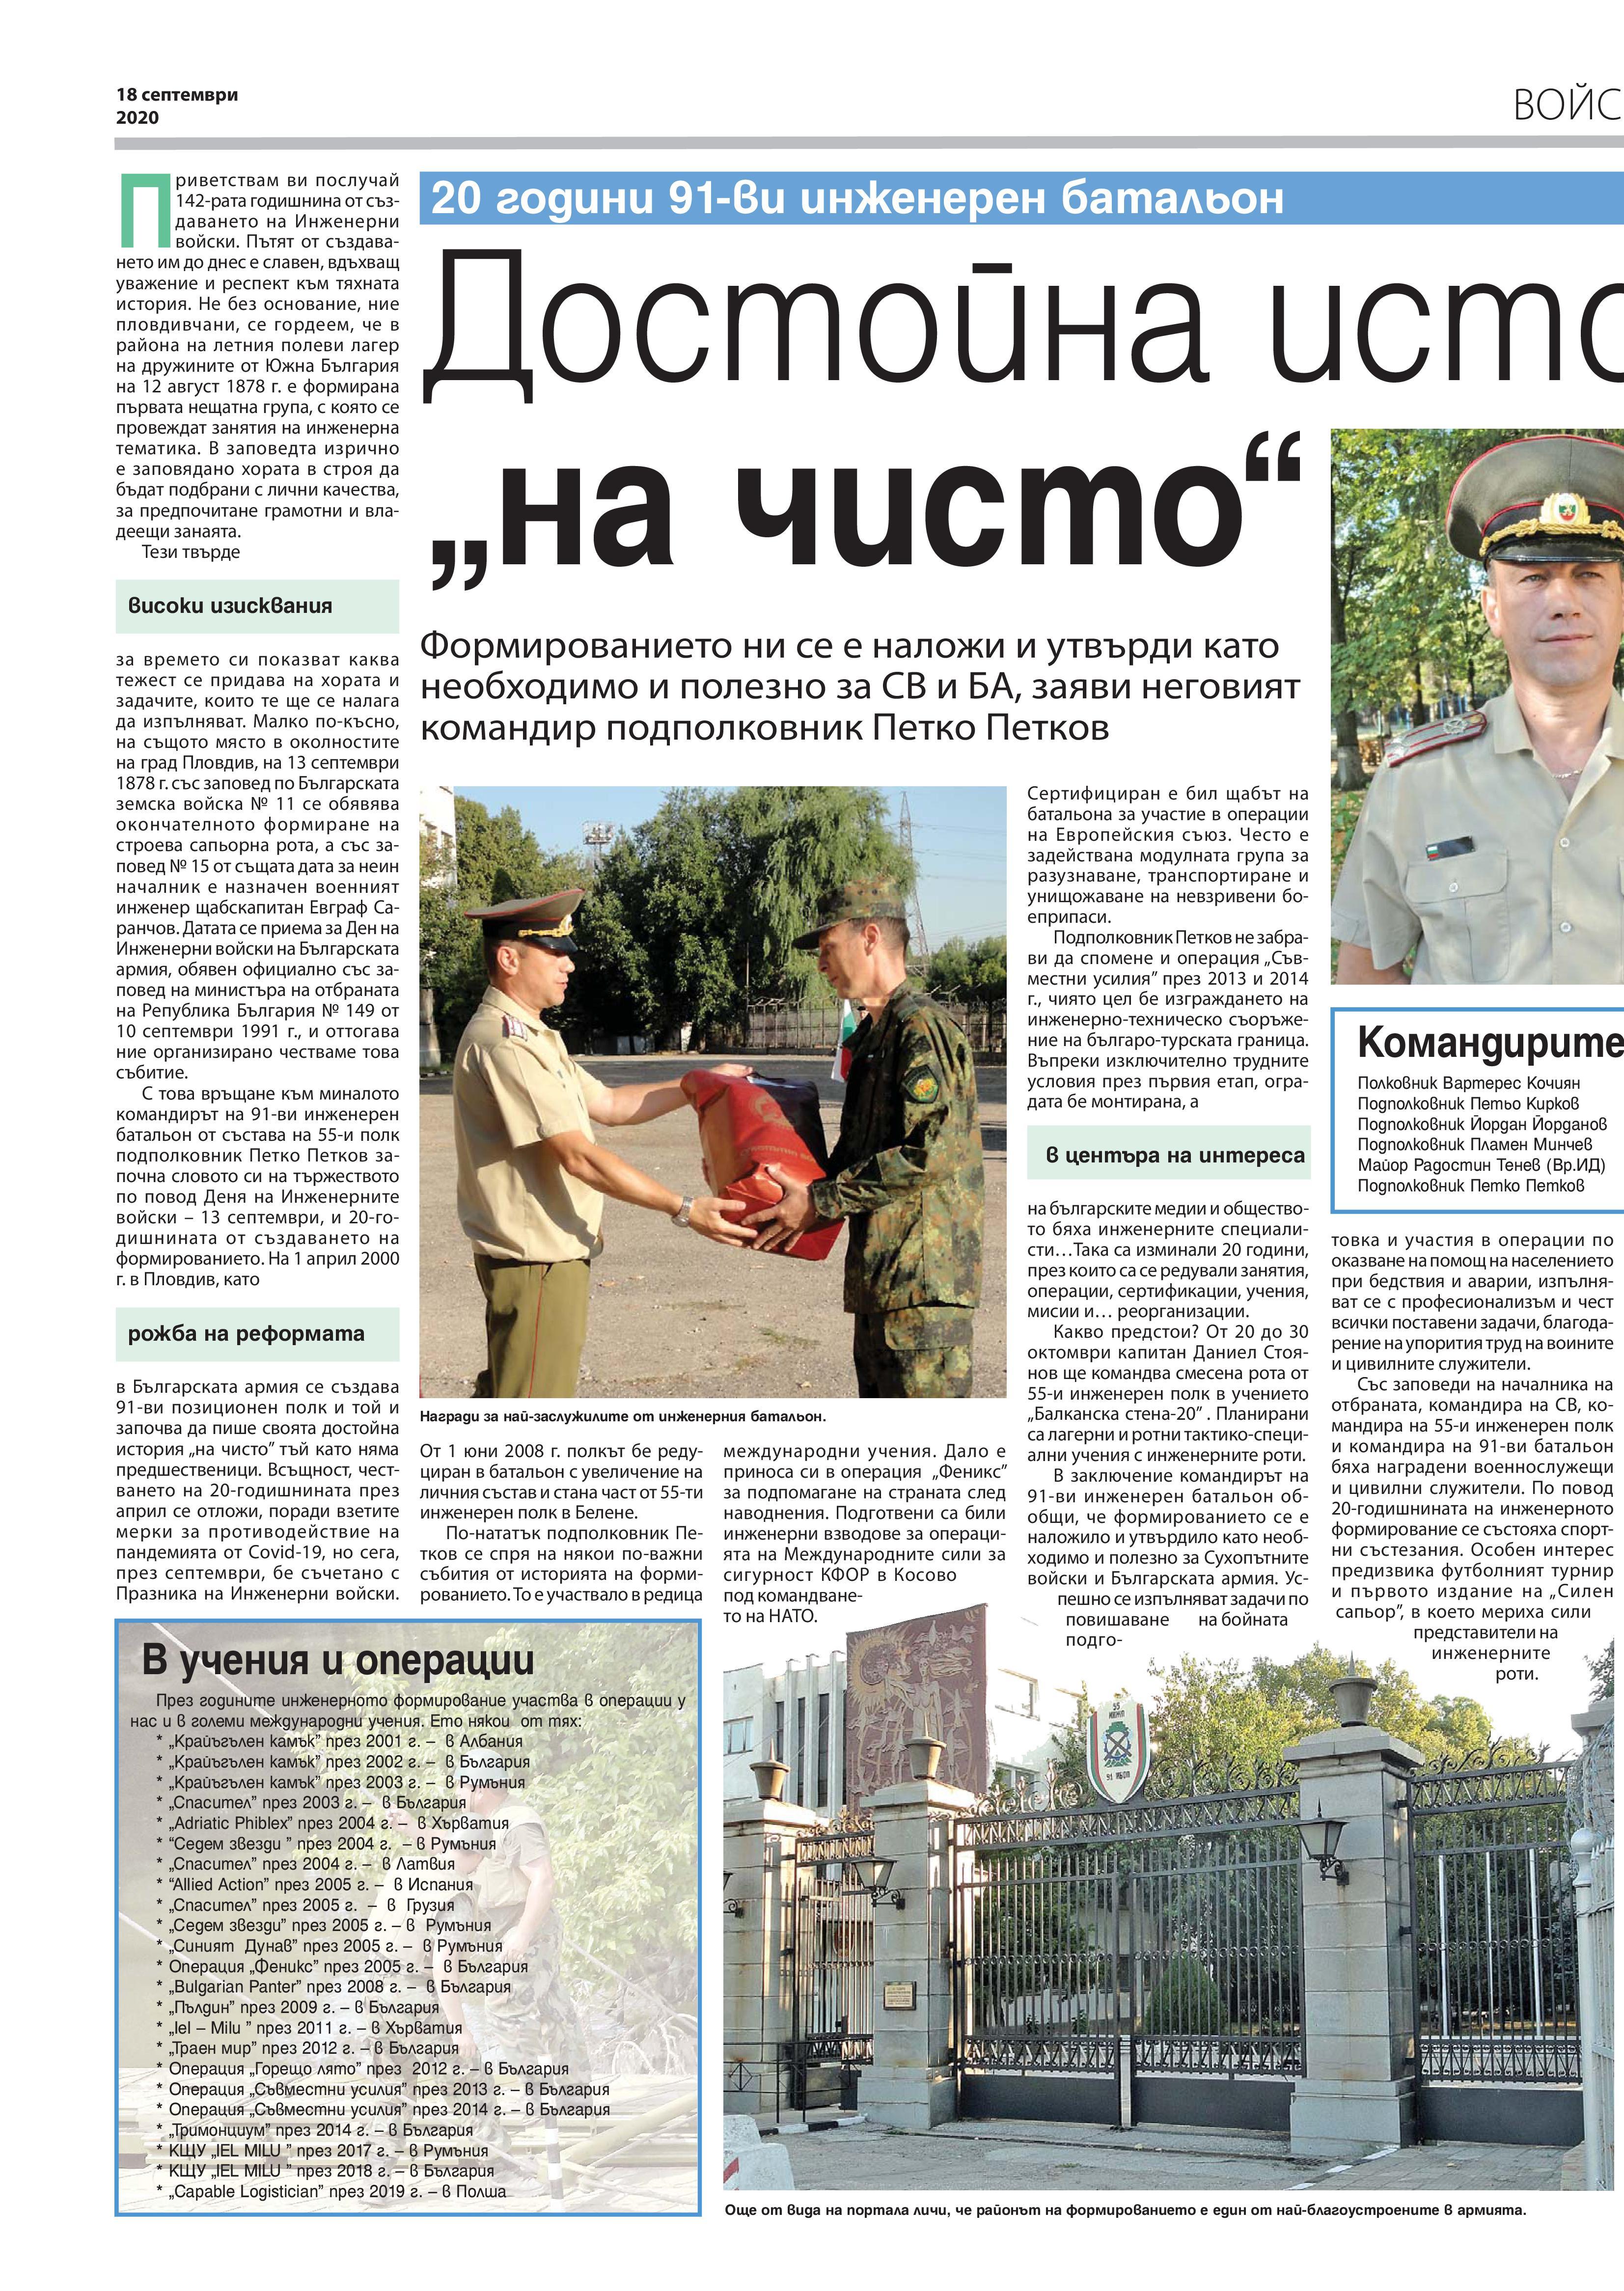 https://armymedia.bg/wp-content/uploads/2015/06/16-41.jpg